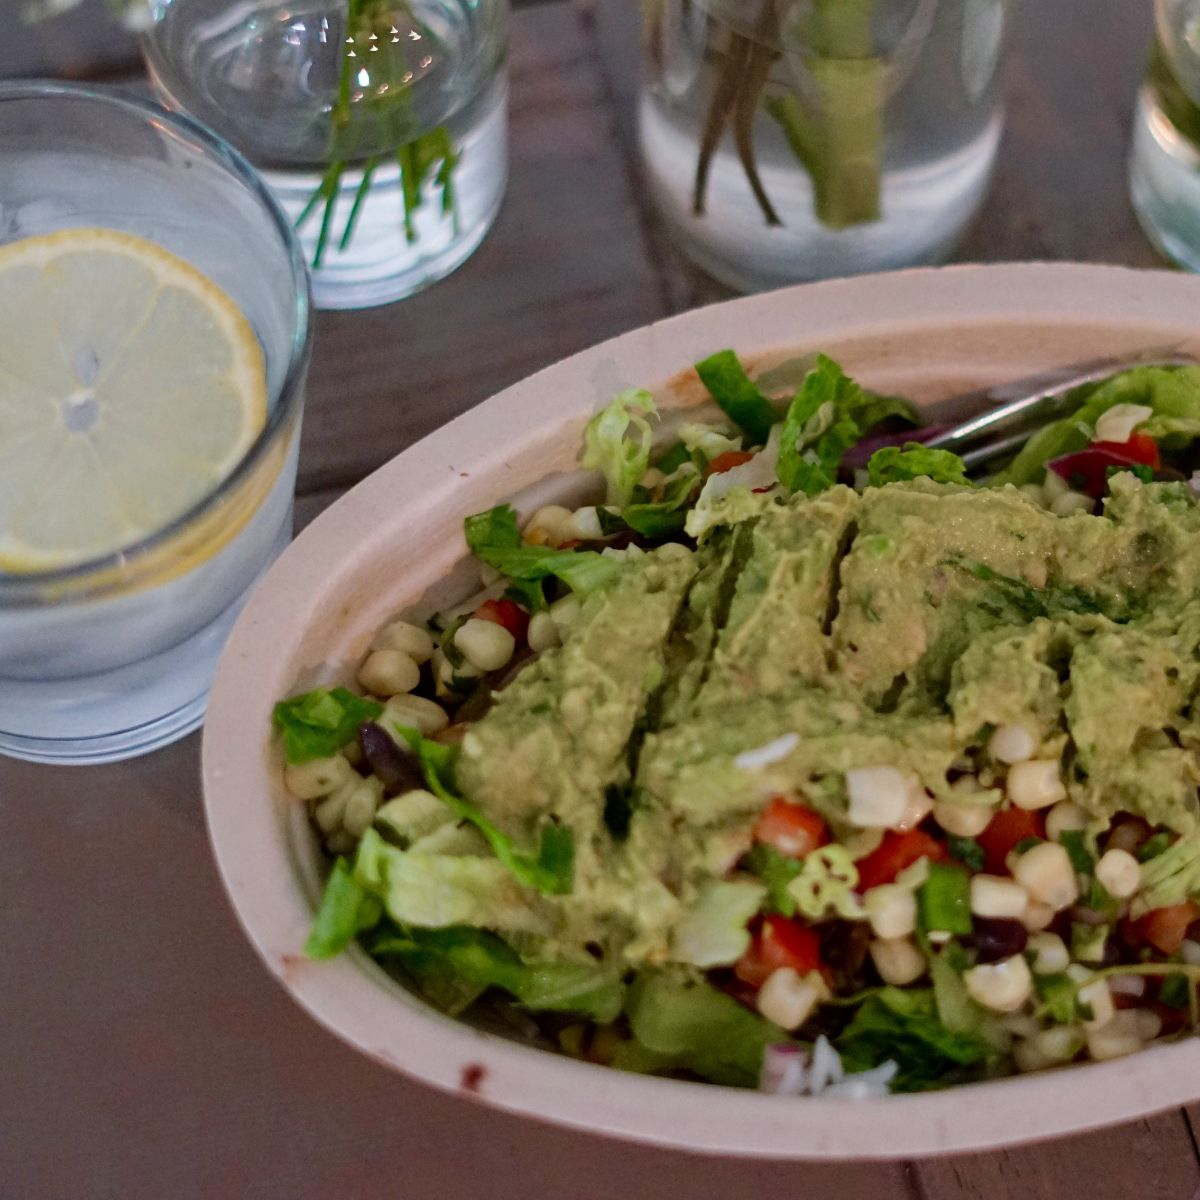 Chipotle - Vegetarian Burrito Bowl